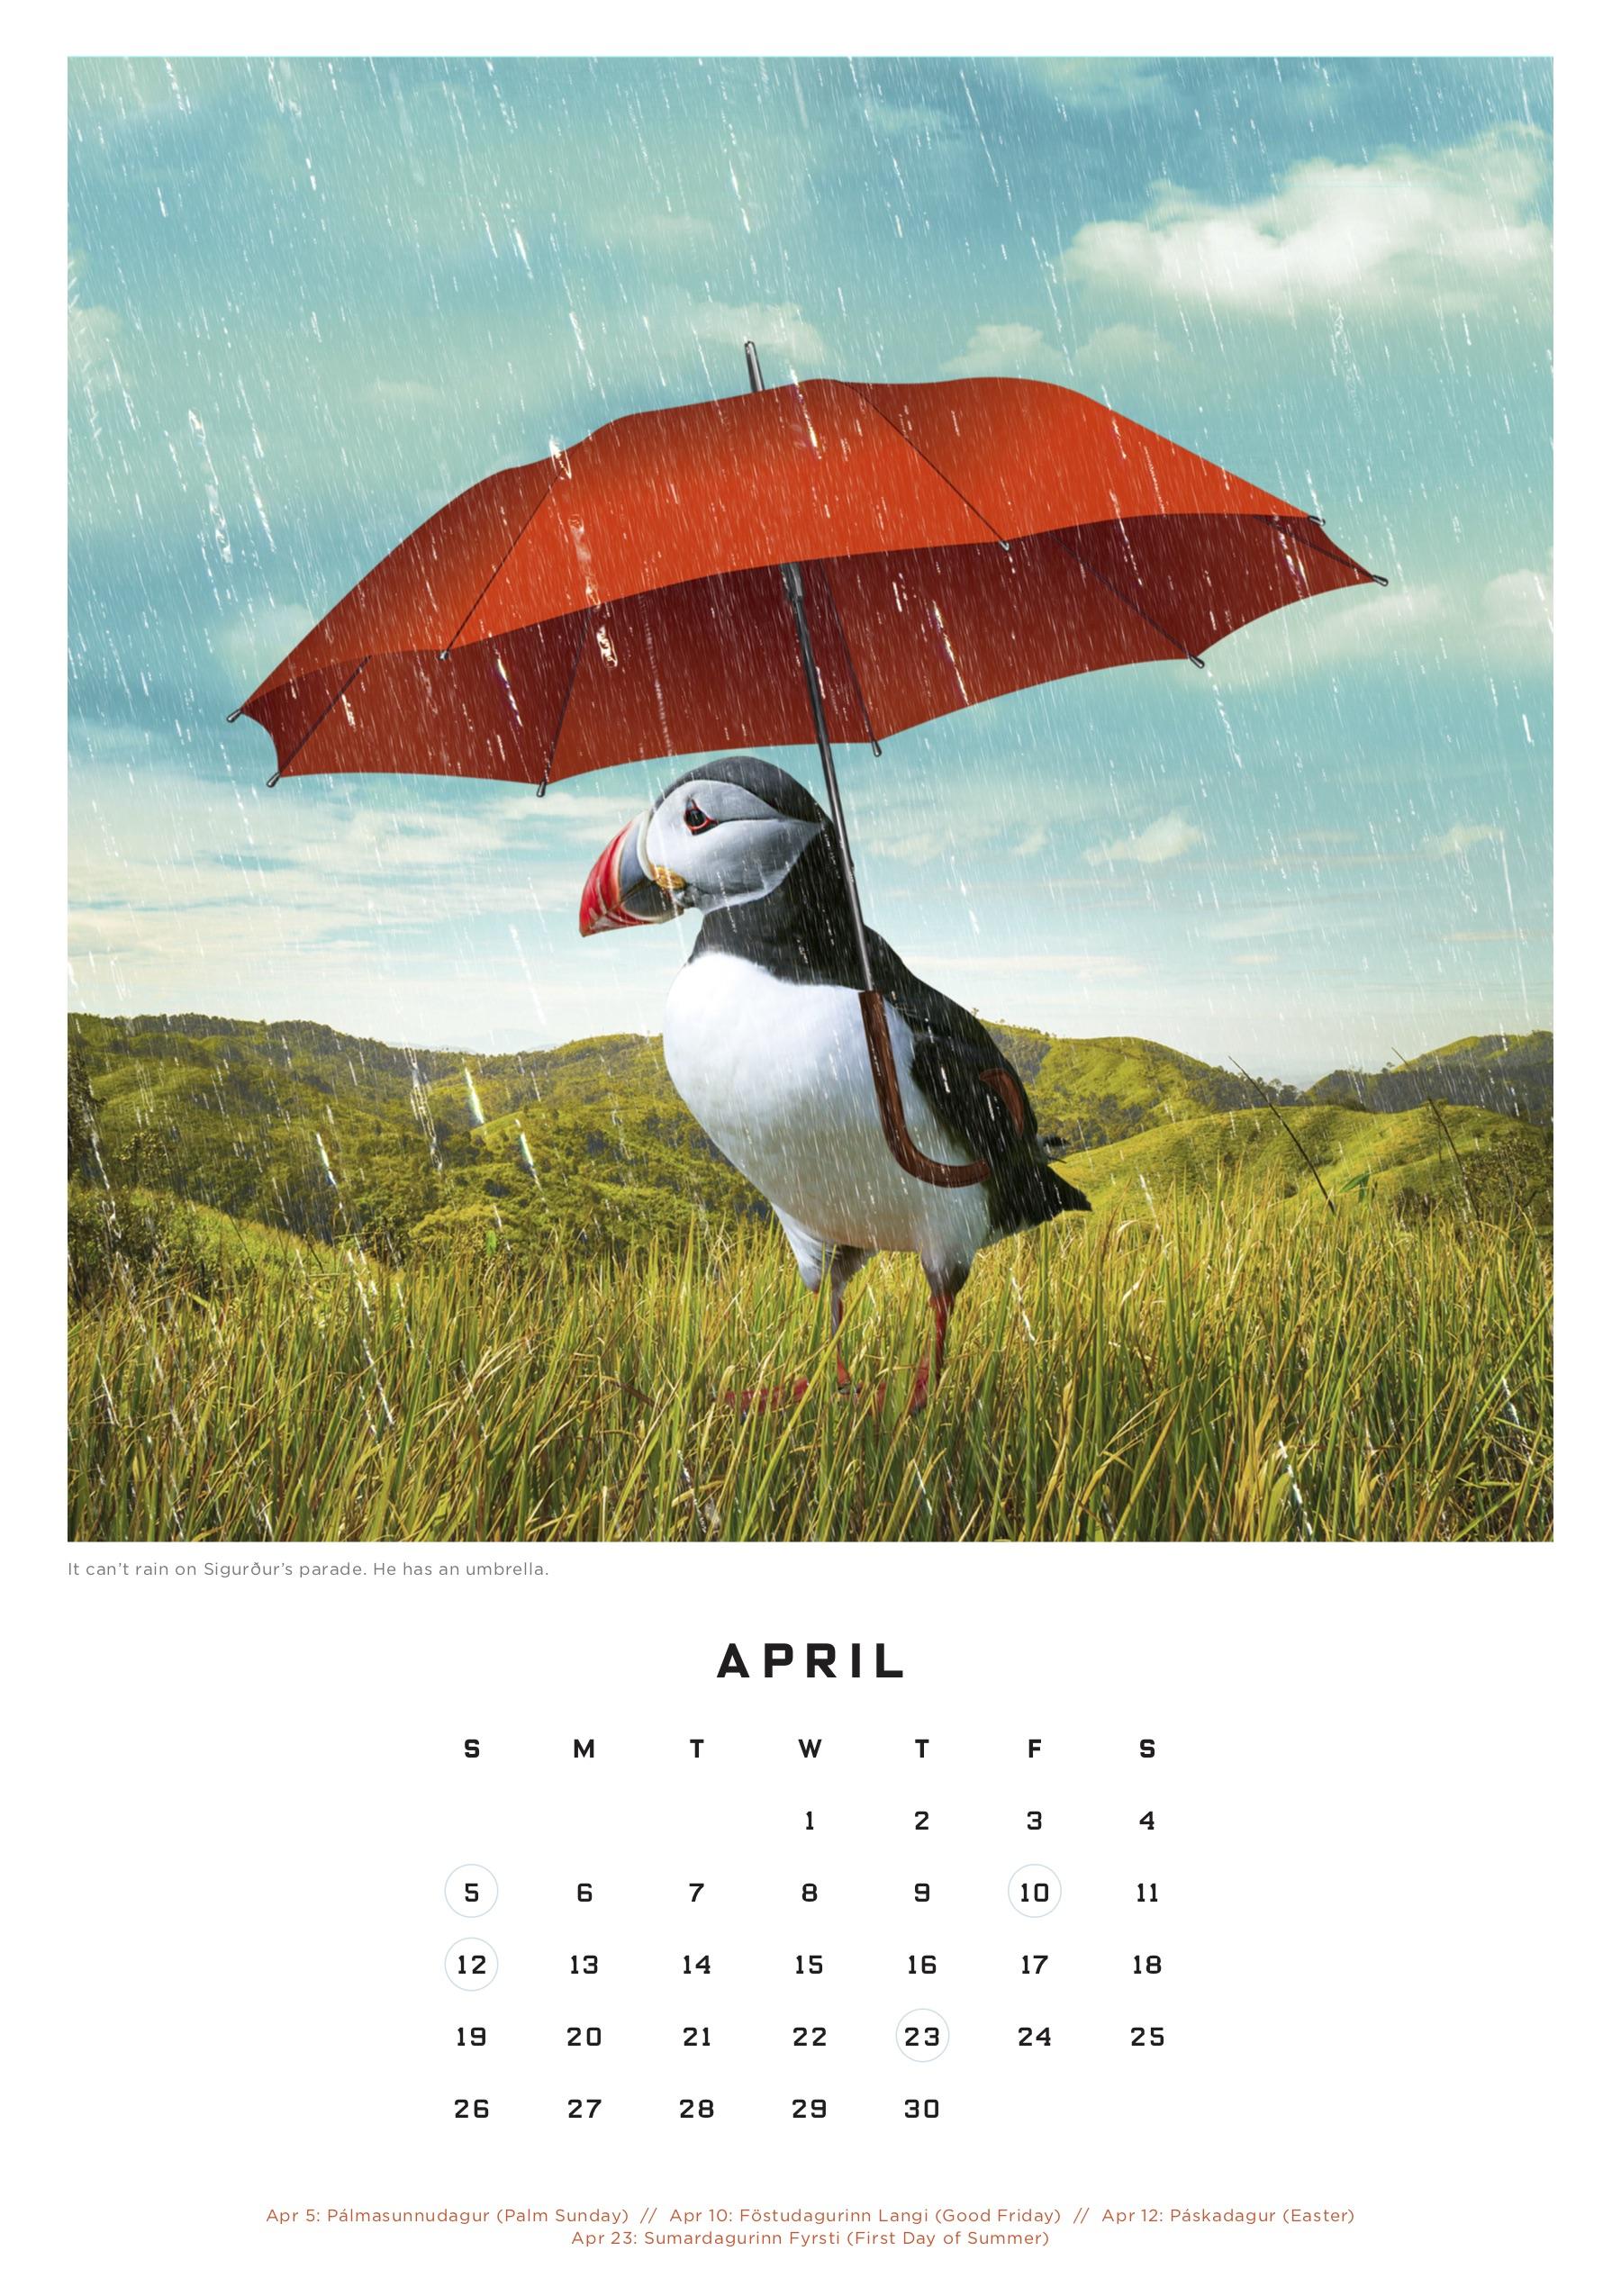 Reyka_adoptpuffin_calendar_full5.jpg